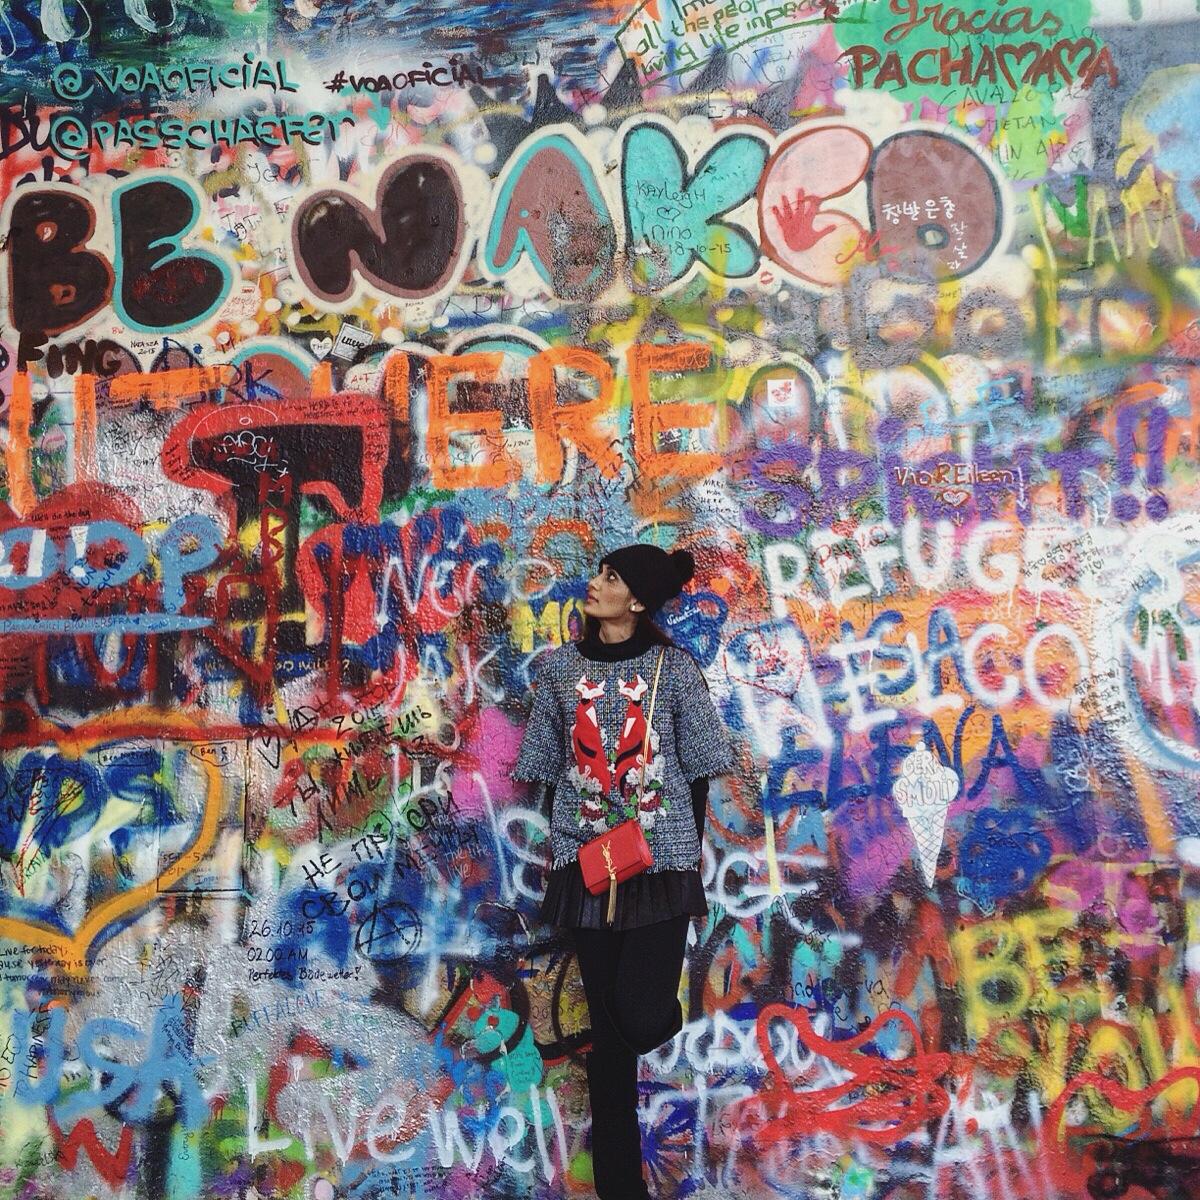 Lennon wall, Pttrague